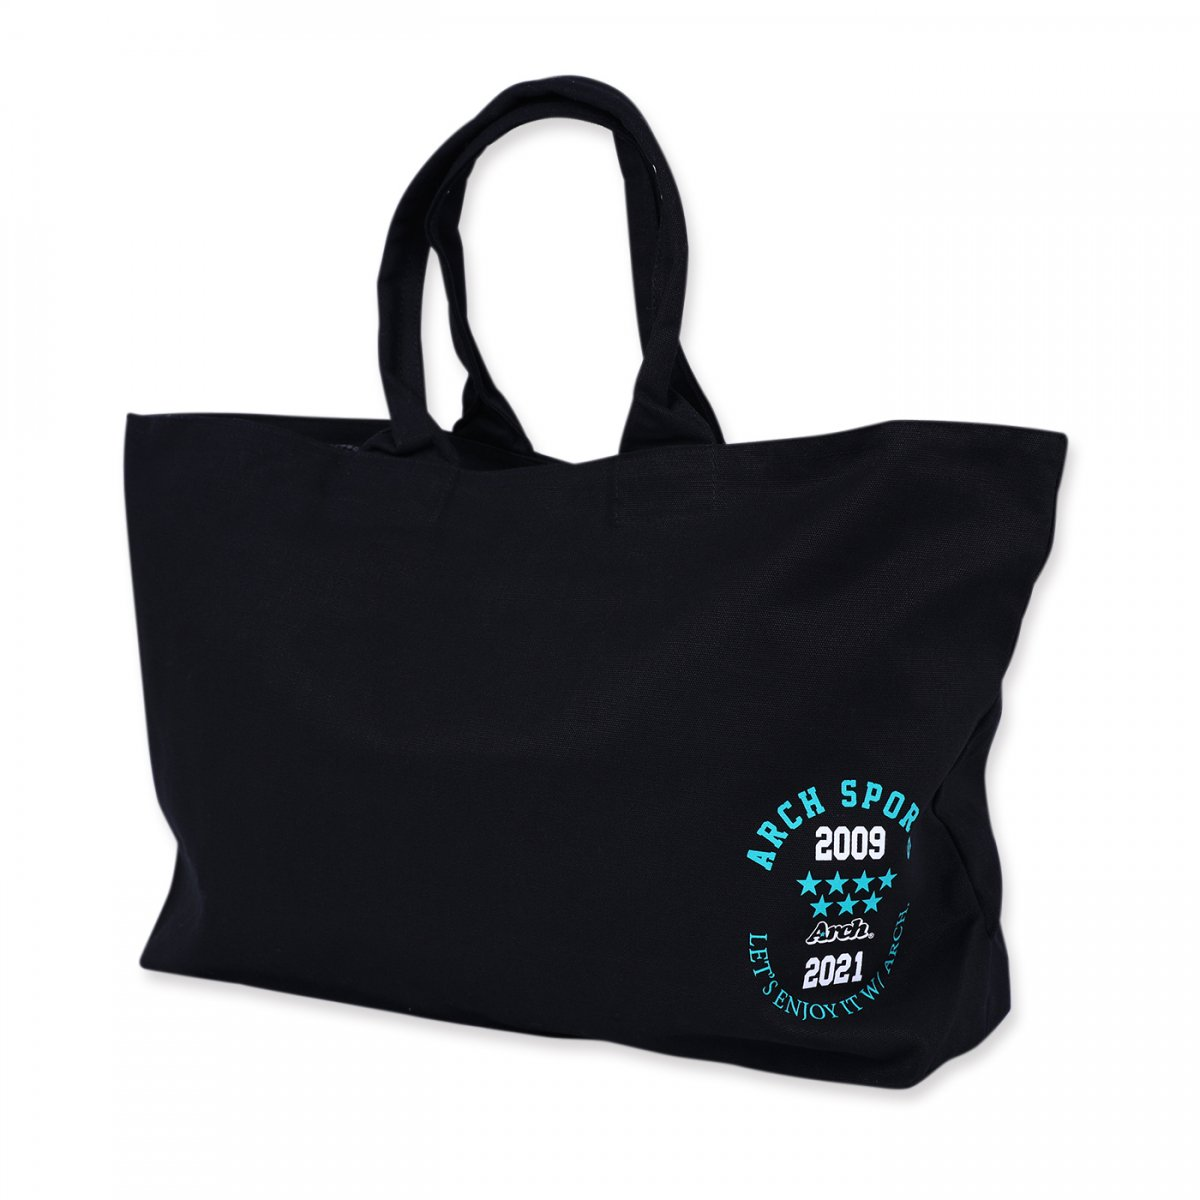 enjoy athletics tote bag 【black】